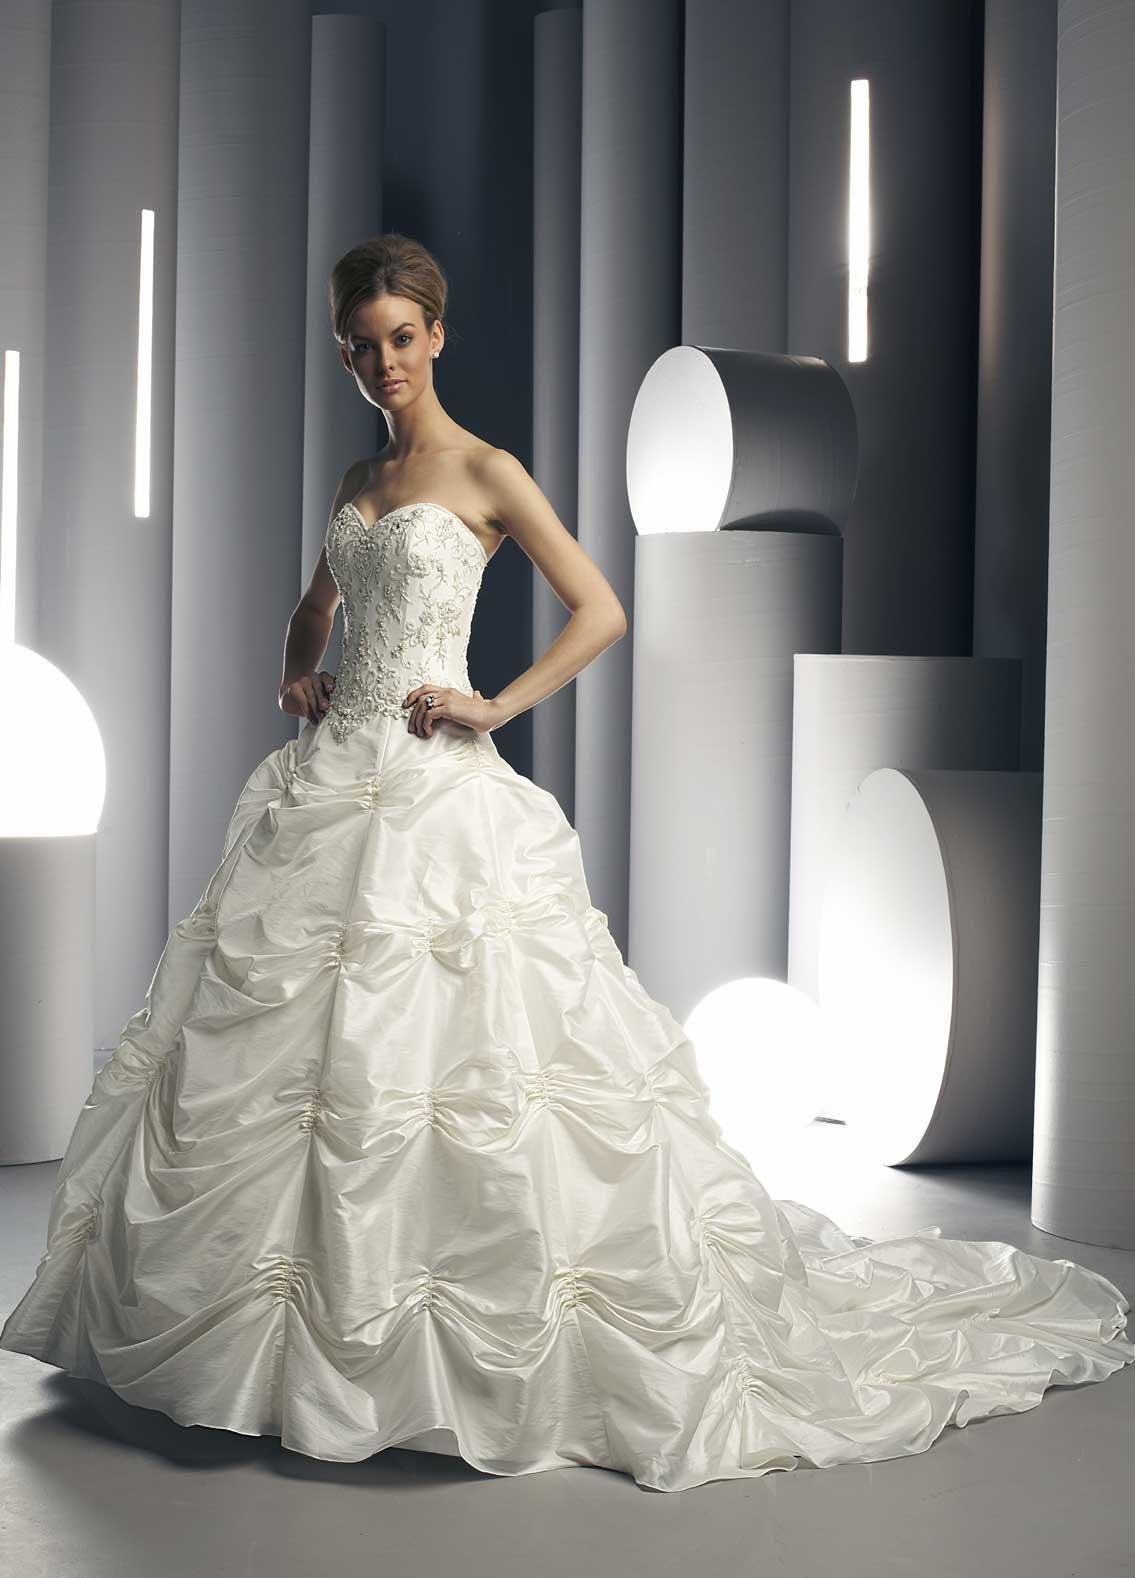 wedding dresses view all bride wedding dress bridal gowns